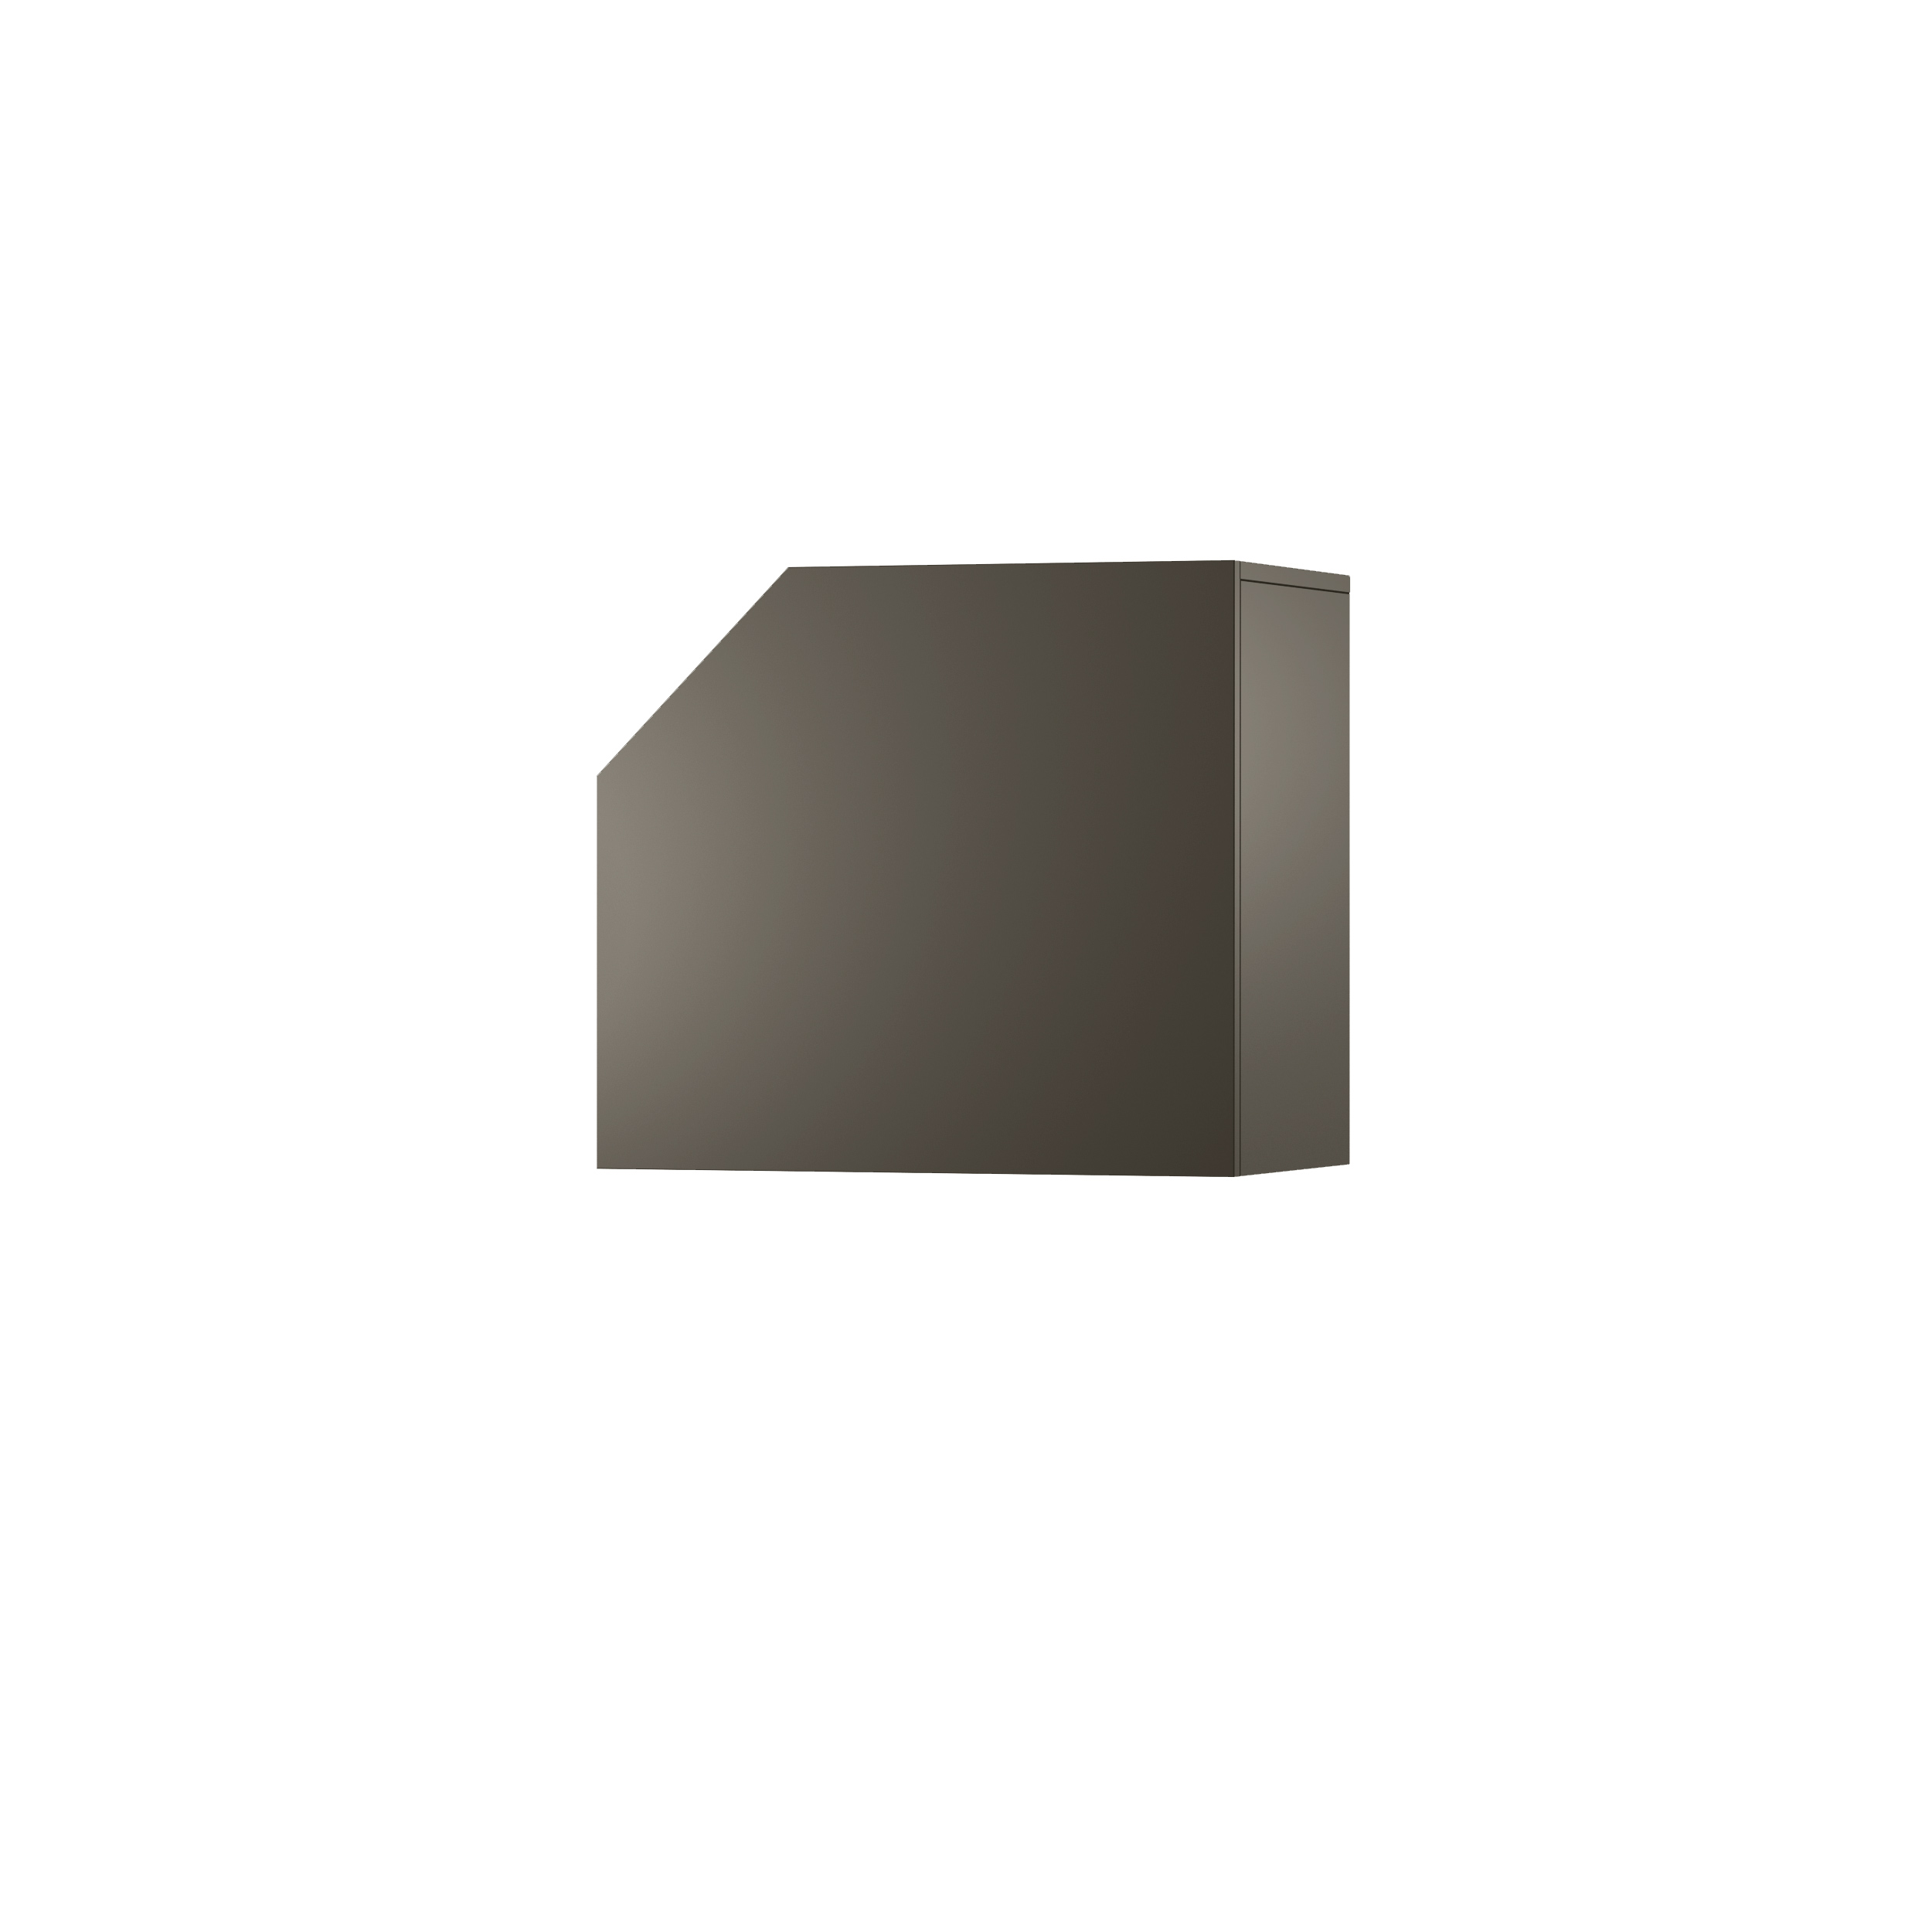 Dulap modular Nook Left Graphite l65xA37xH58 cm